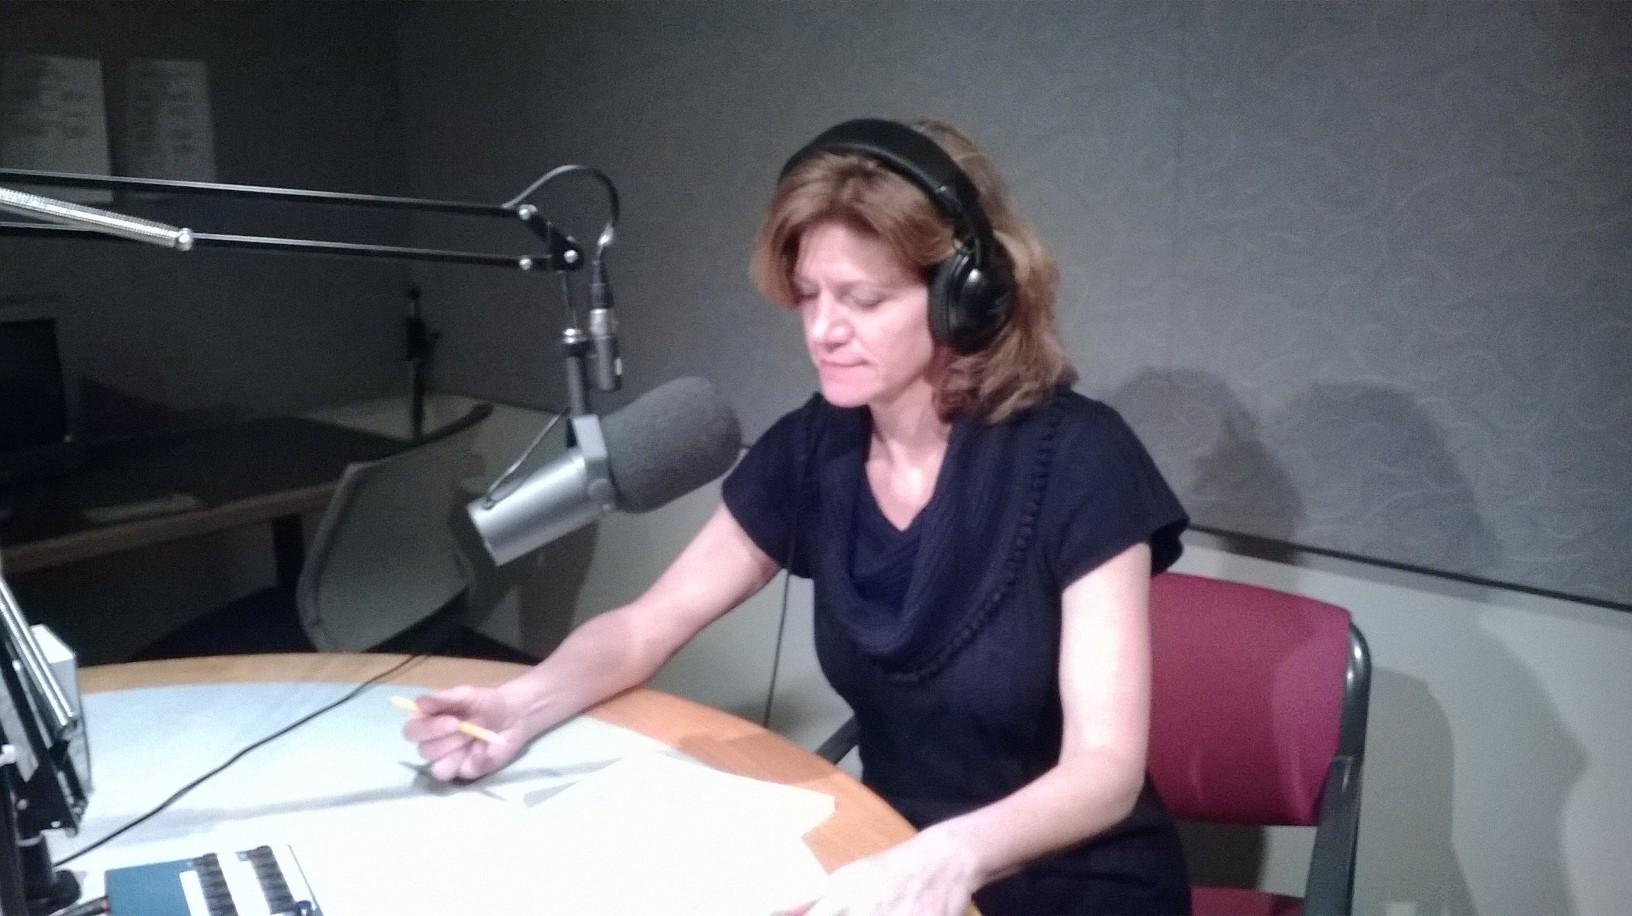 Colette Loll at CBC interview